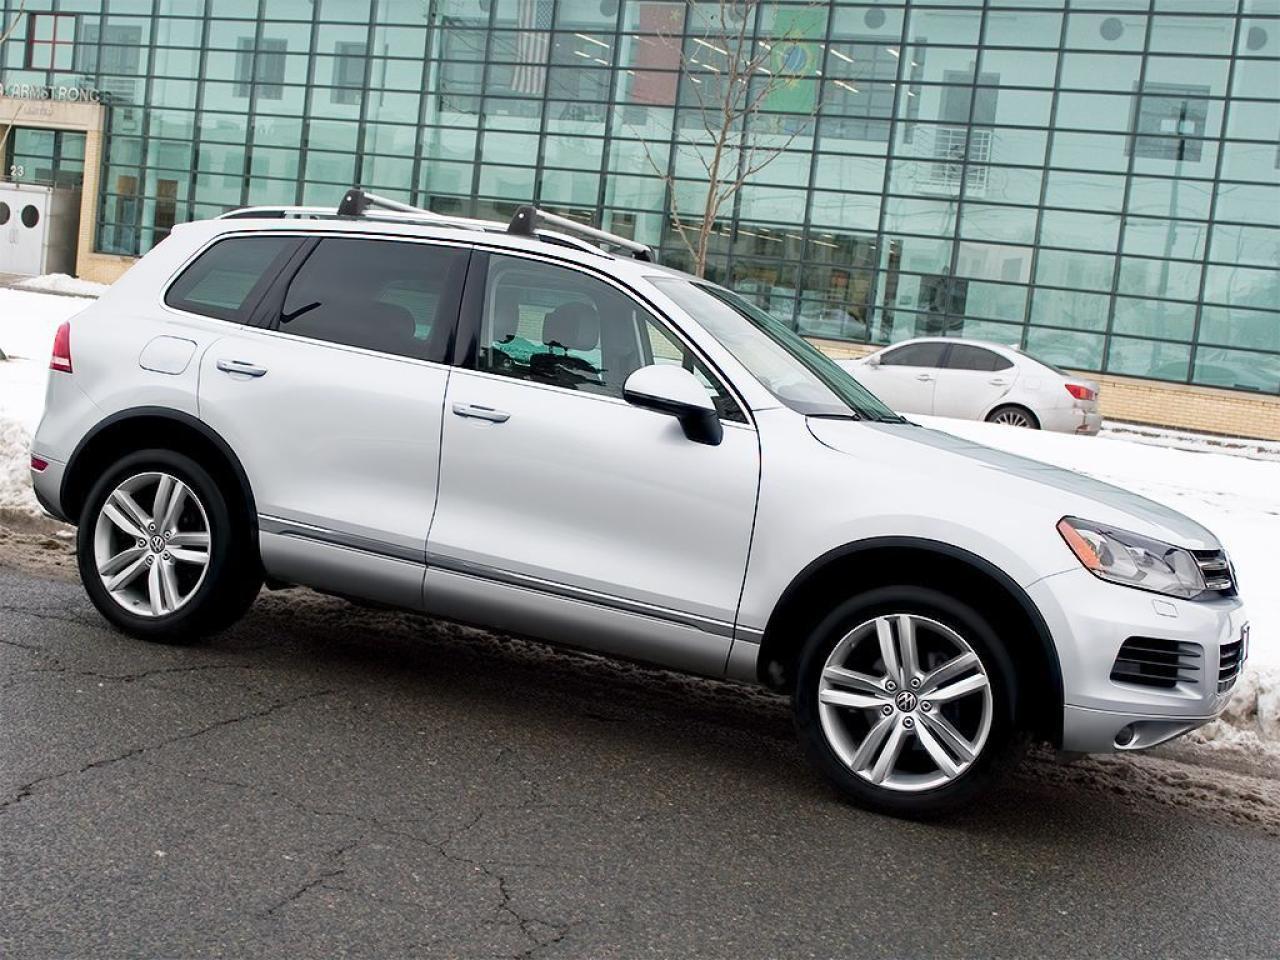 2013 Volkswagen Touareg EXEC|NAVI|REARCAM|PANOROOF